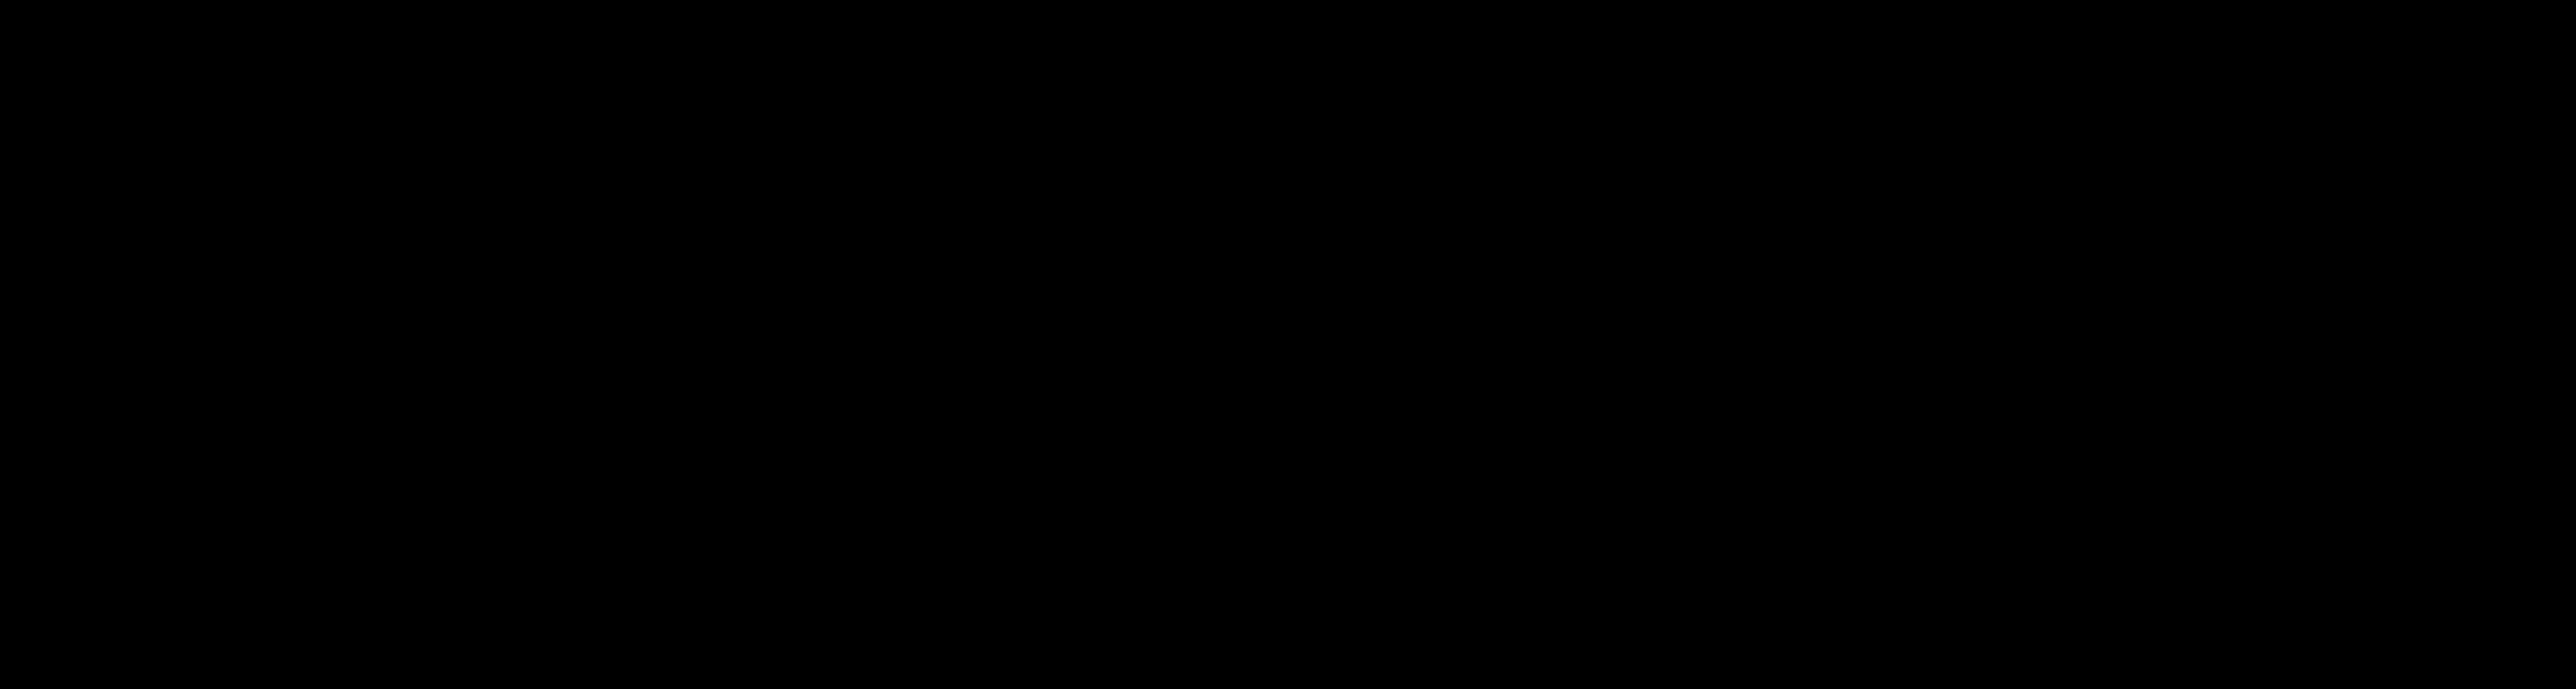 Download HD General Electric - Ge Lighting Logo Png Transparent PNG